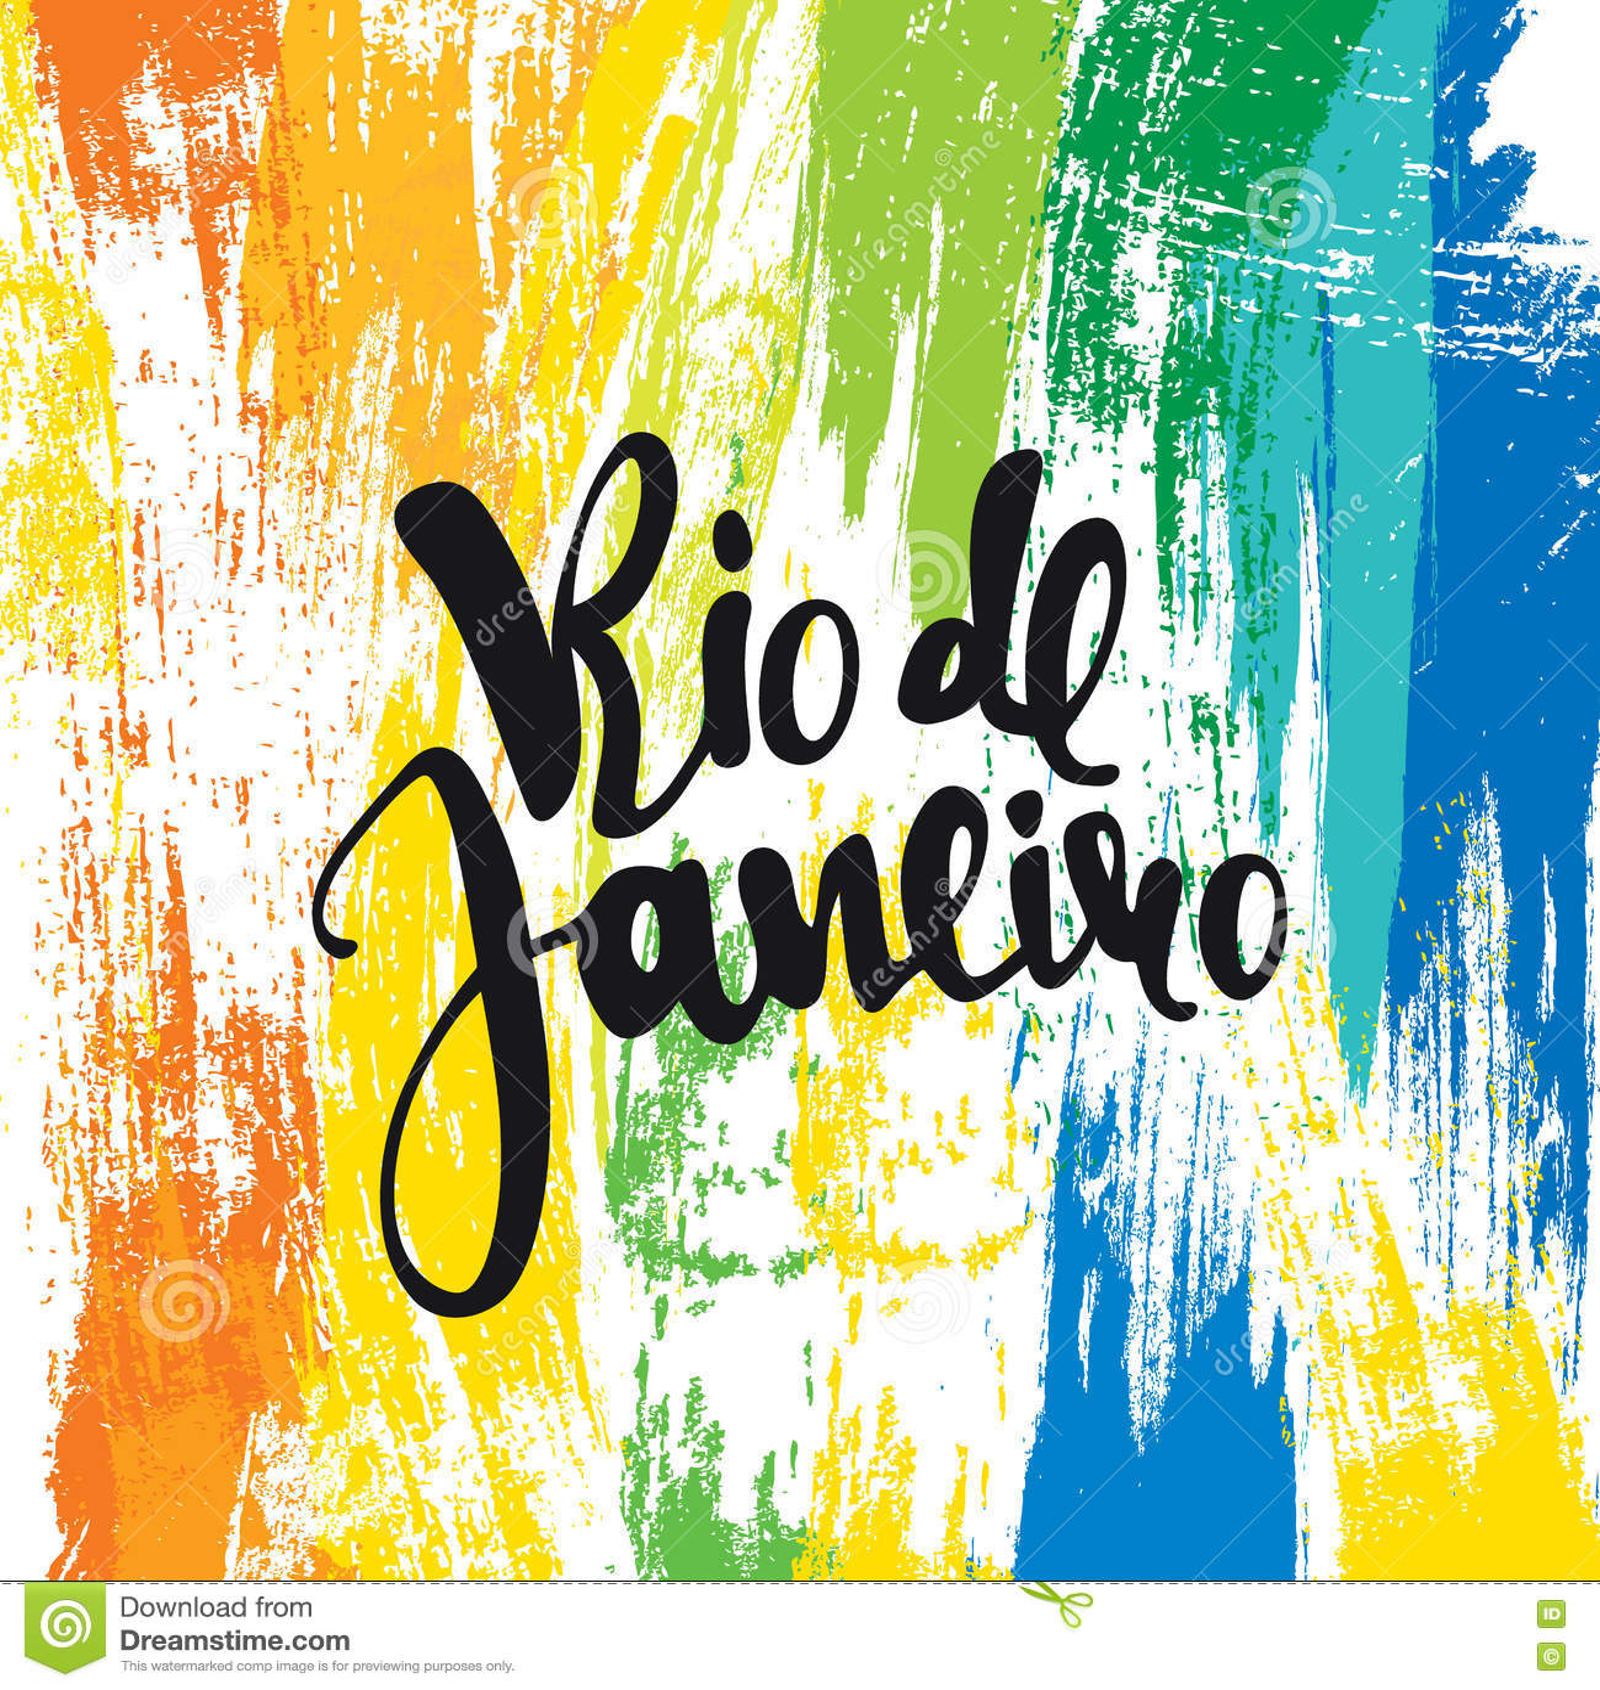 Handmade watercolor brazil flag brasil stock photos freeimages com - Rio De Janeiro Inscription Background Colors Of The Brazilian Flag Stock Photo